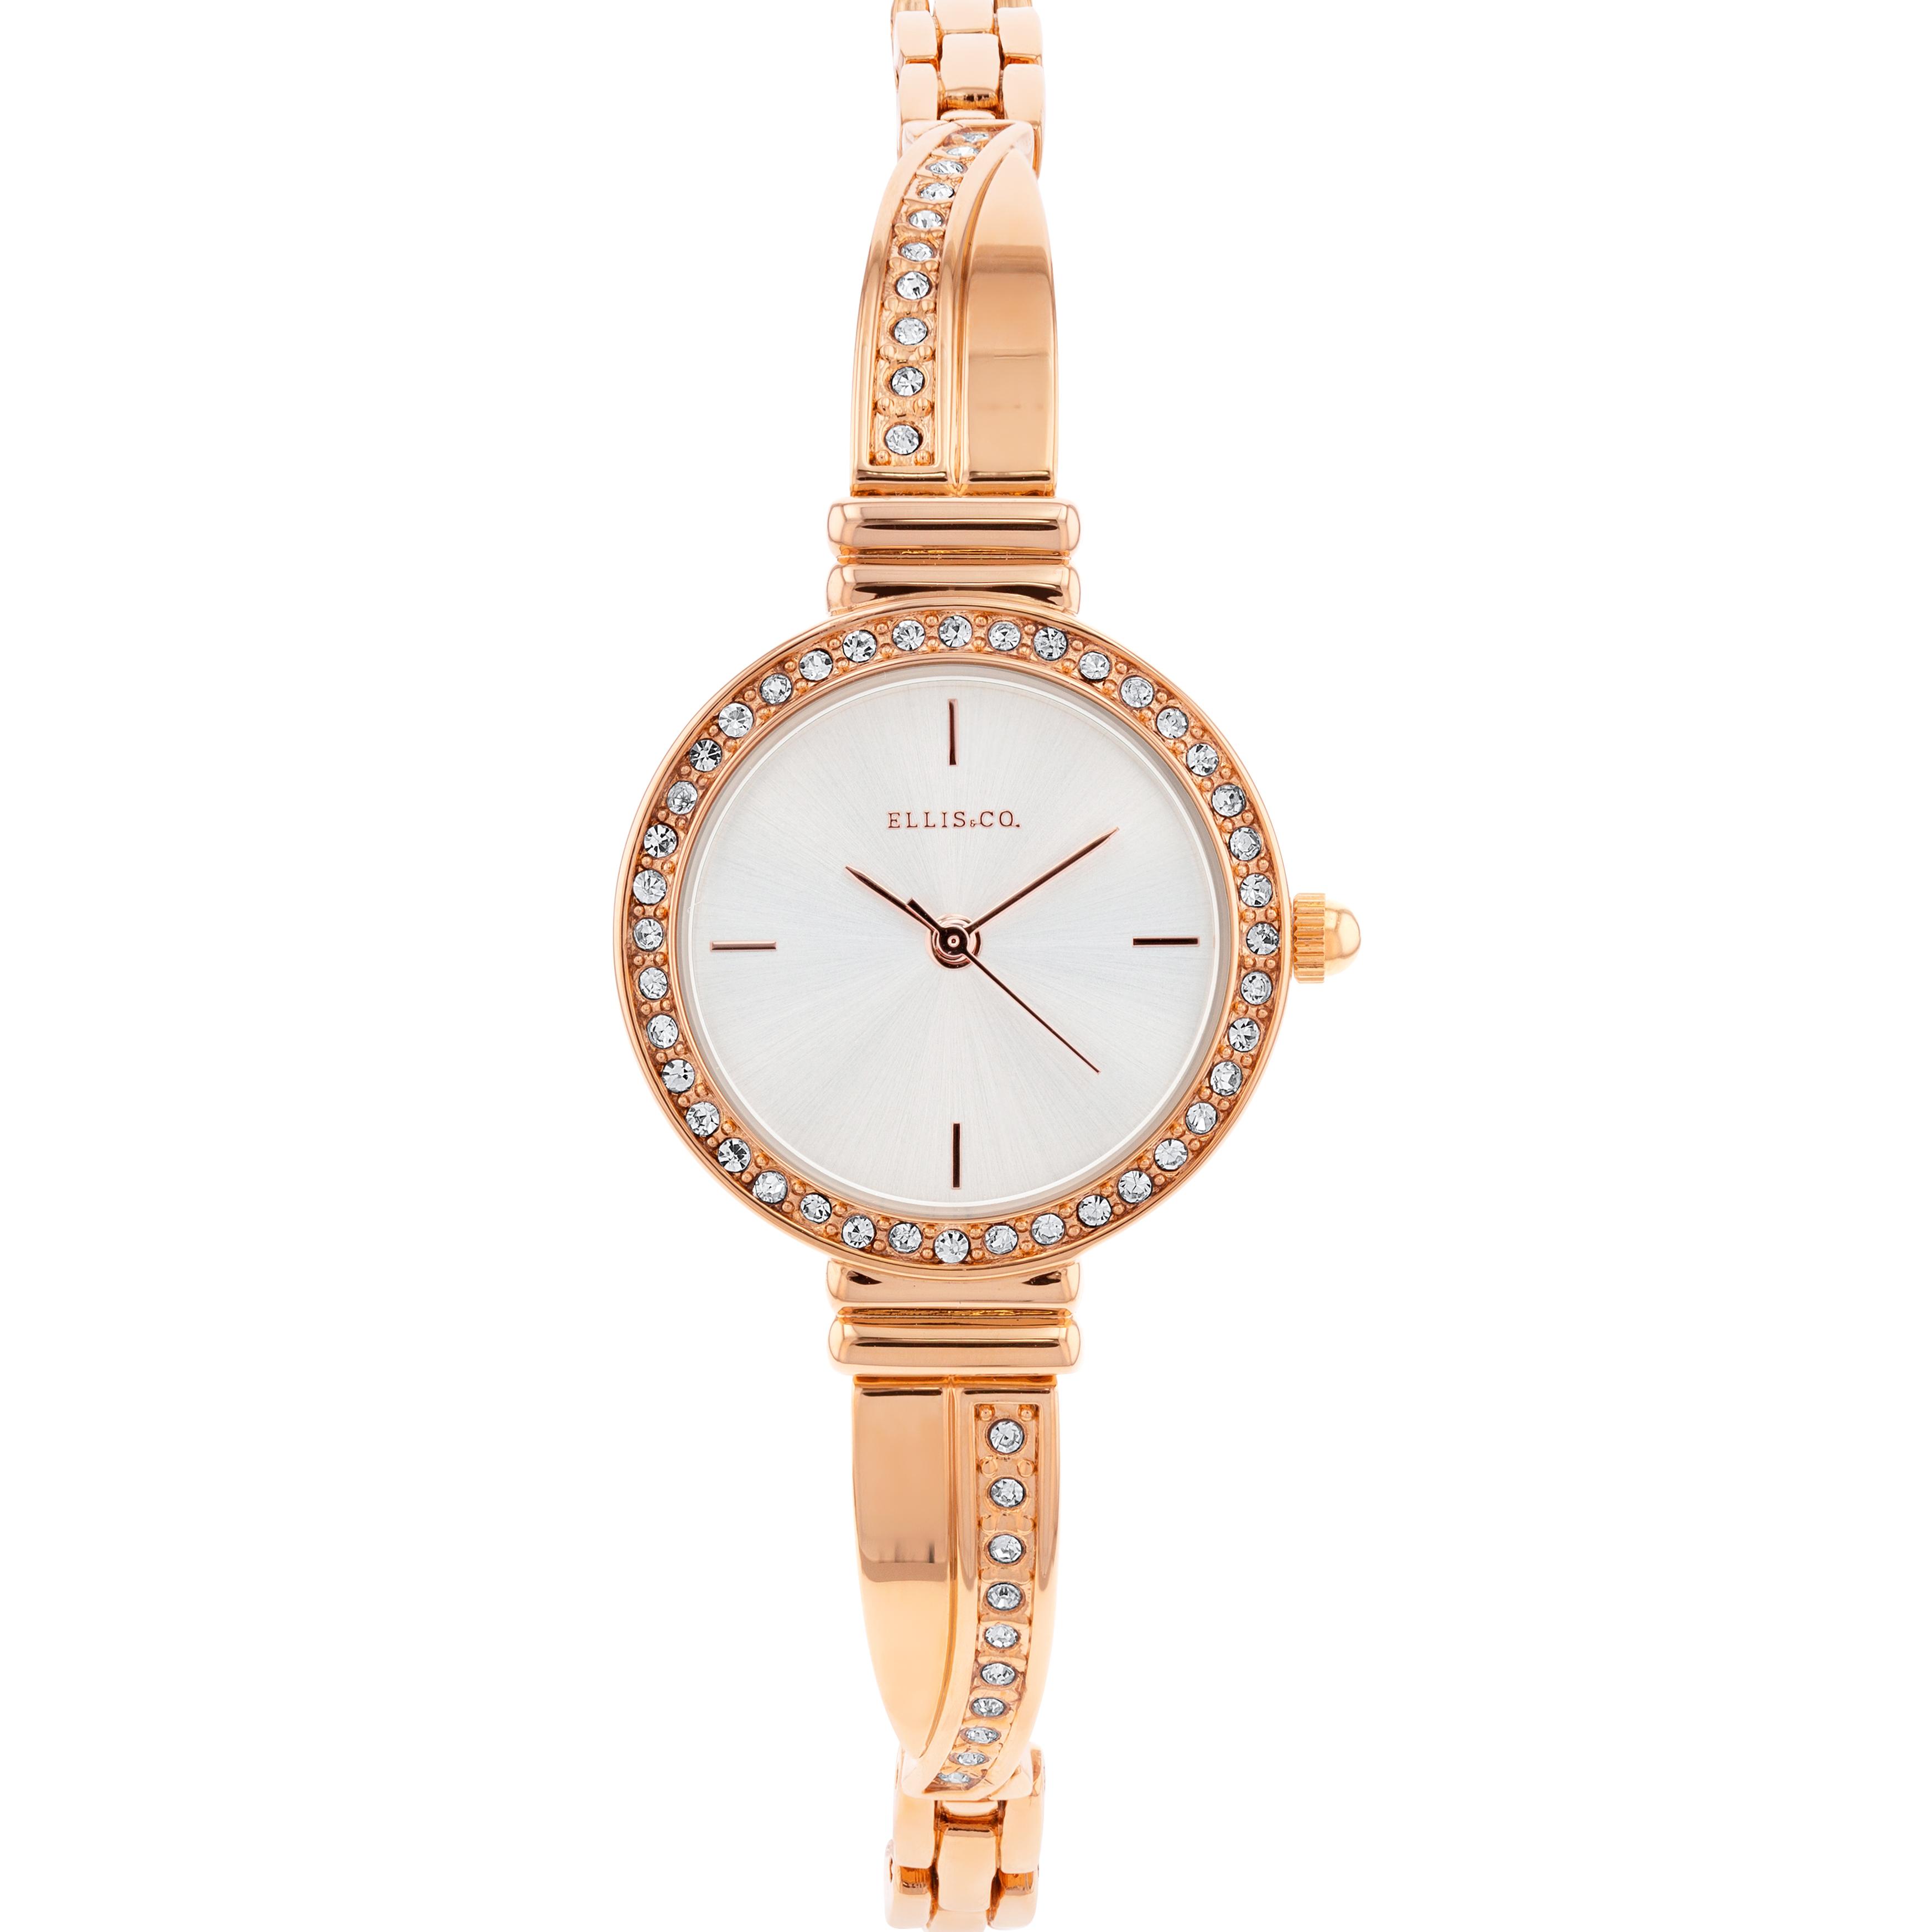 Ellis & Co ' Erika' Rose Gold Plated Women's Watch